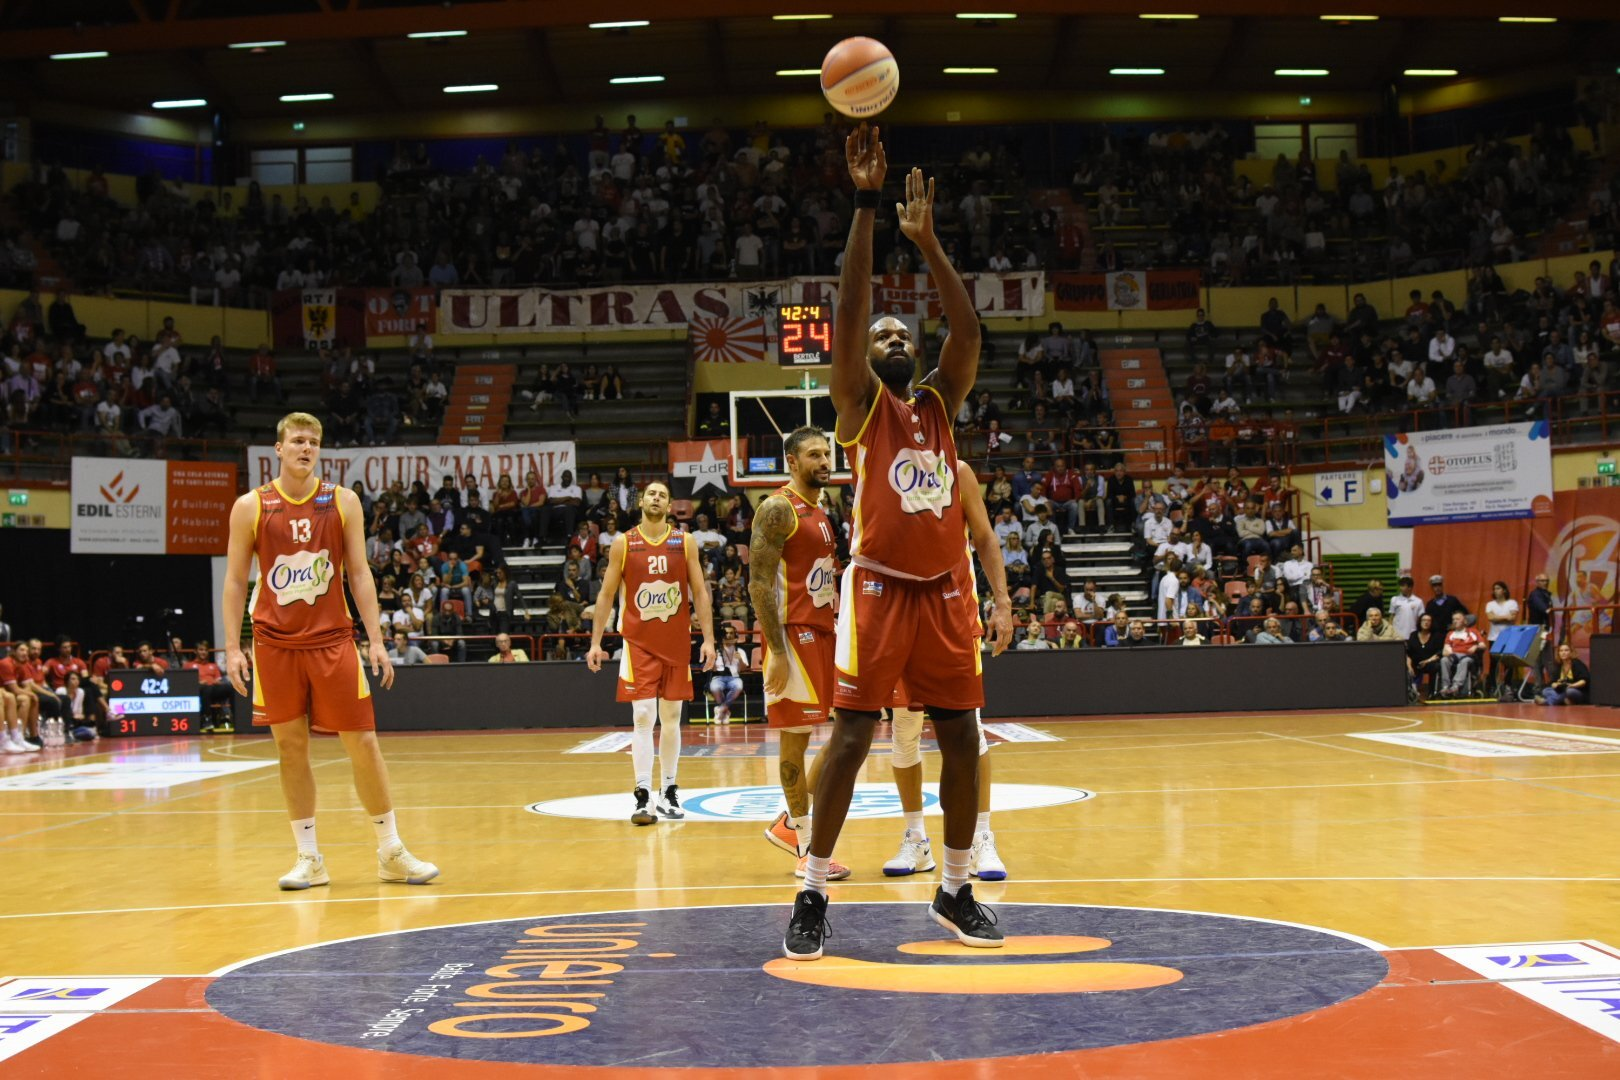 Basket, la prevendita a Ravenna per OraSì-Unieuro